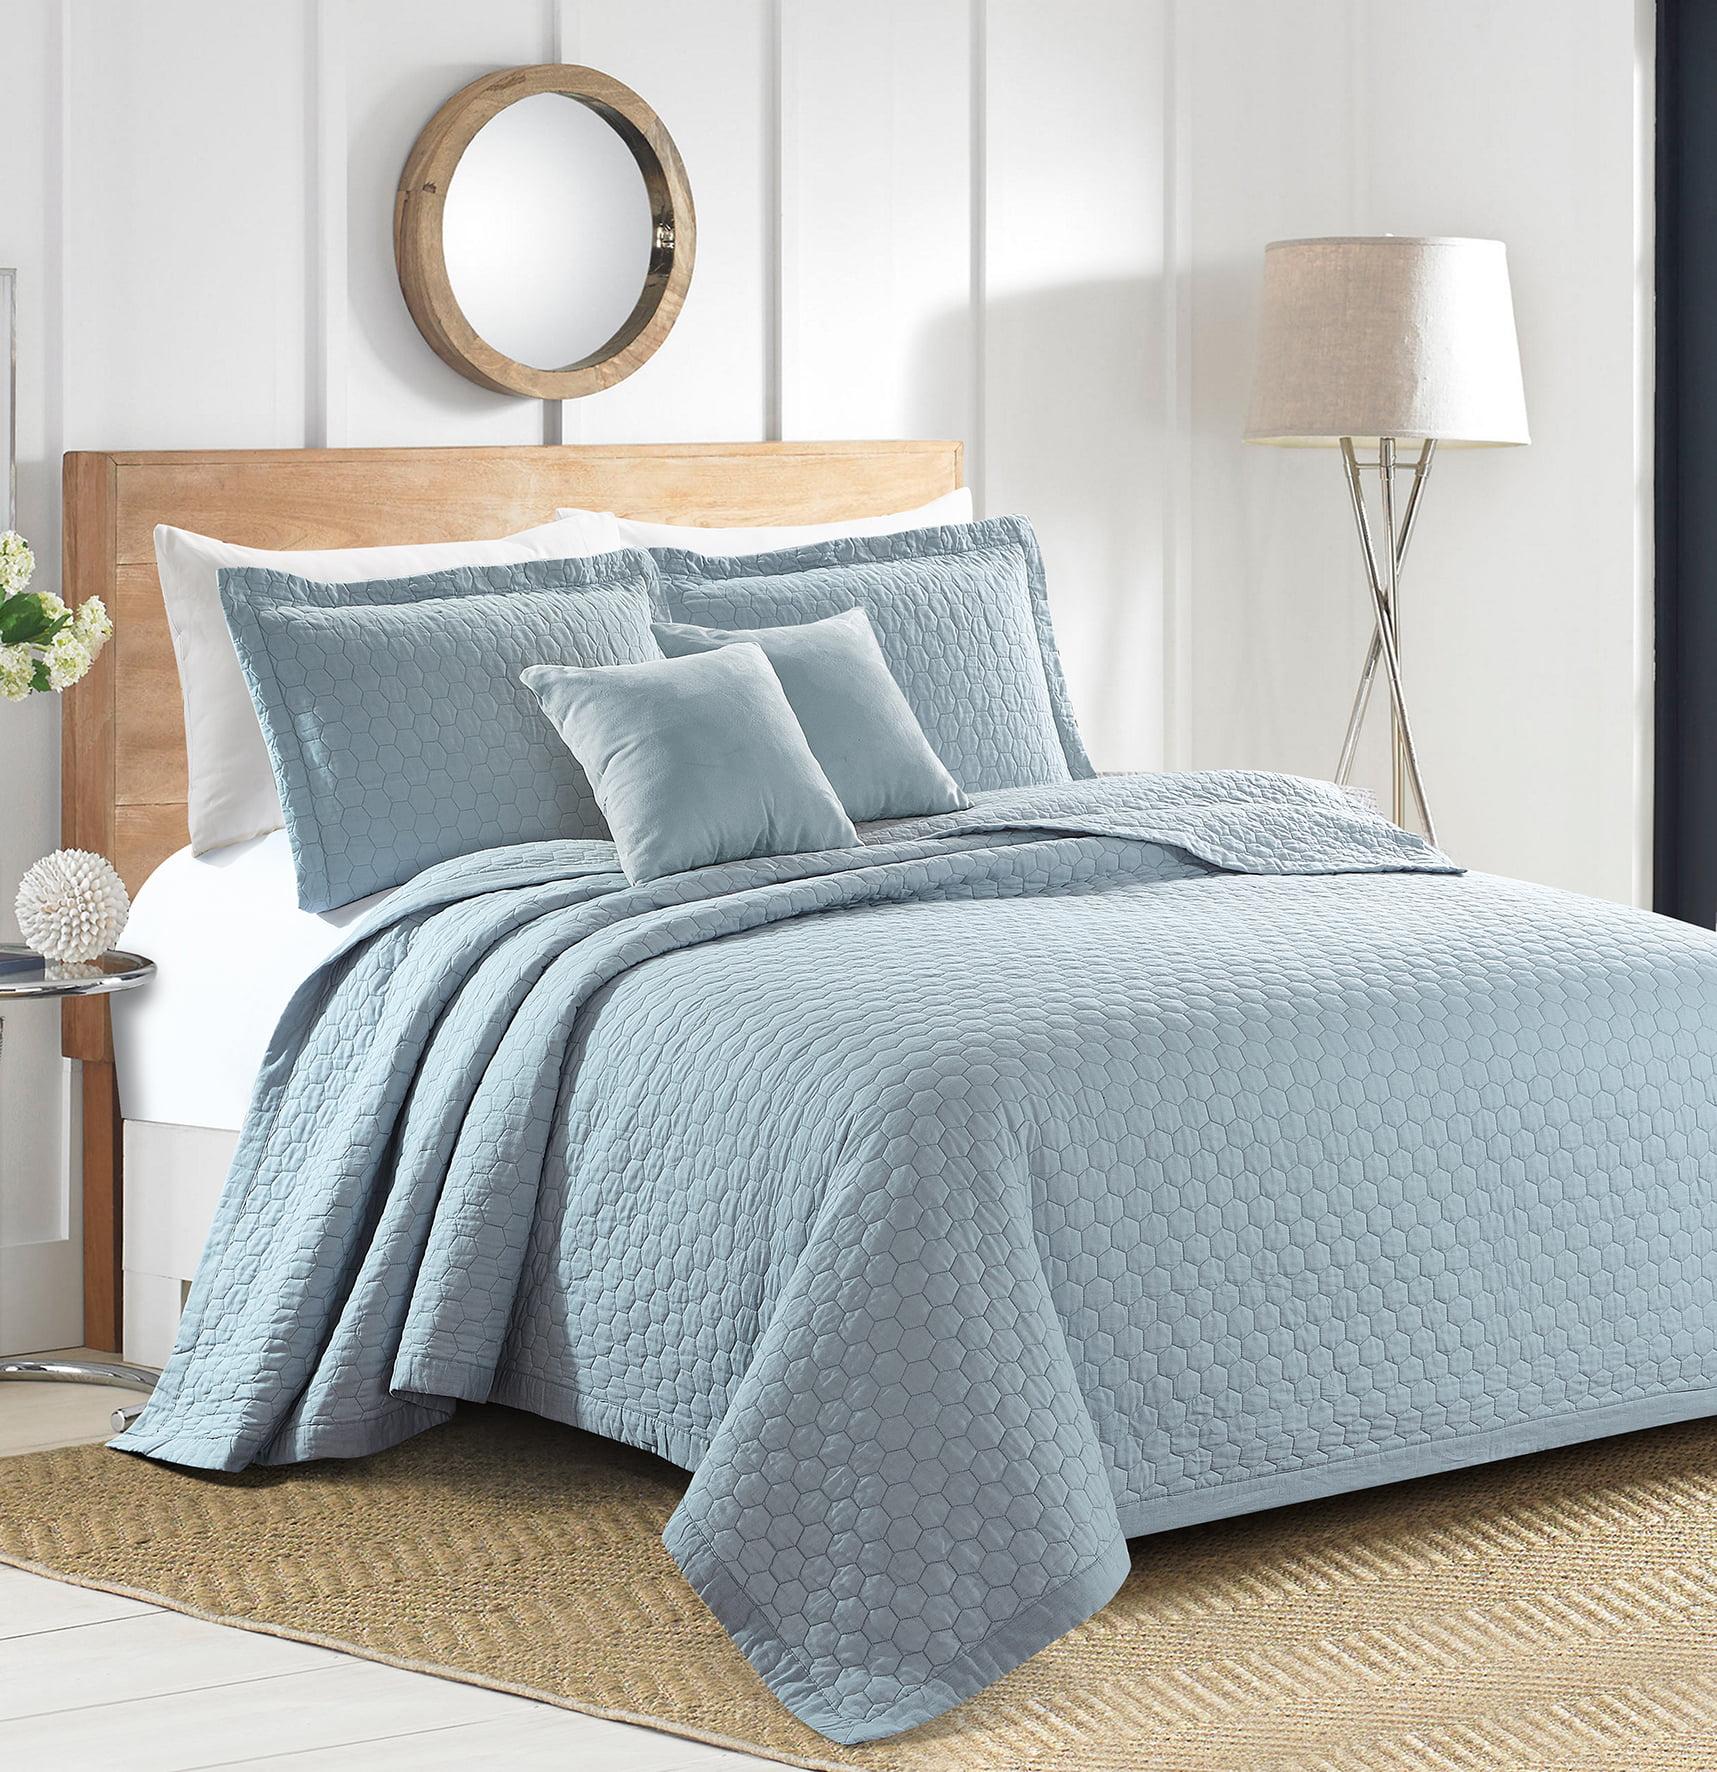 Sherry Kline Rombo Embroidered 3-piece King Light blue Cotton Quilt Set